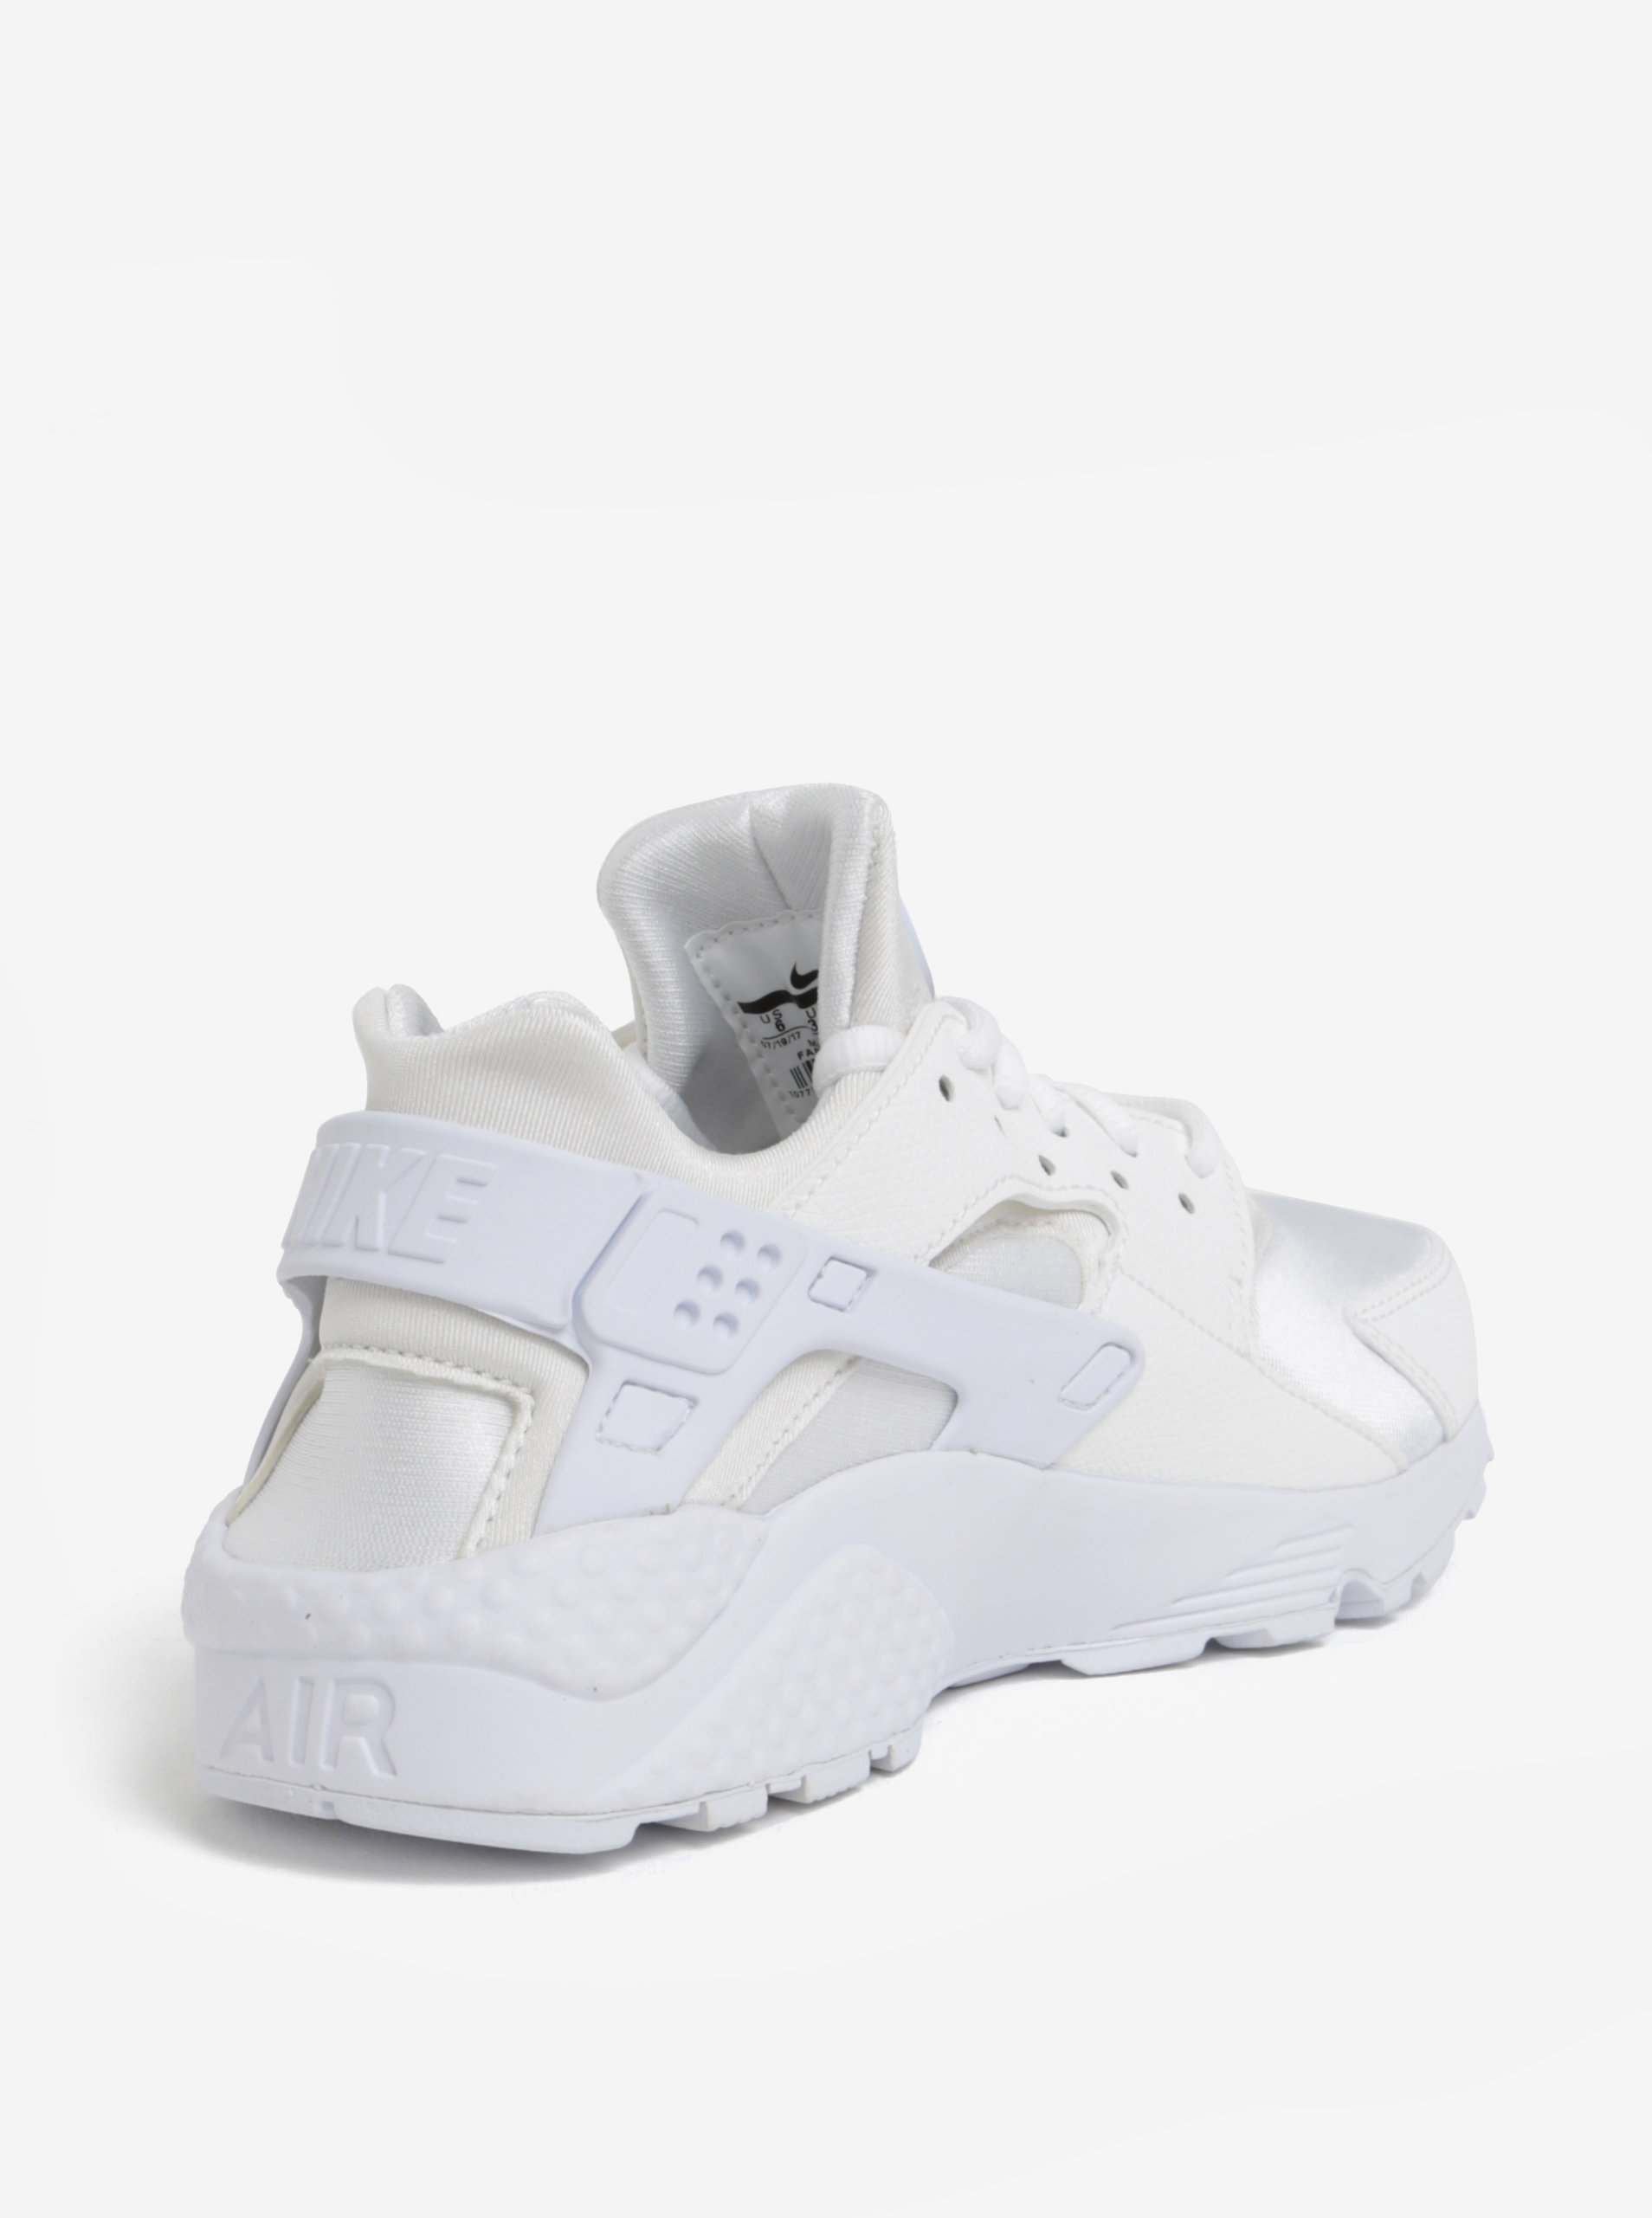 Biele dámske tenisky Nike Air Huarache Run ... ed70fb09e2a